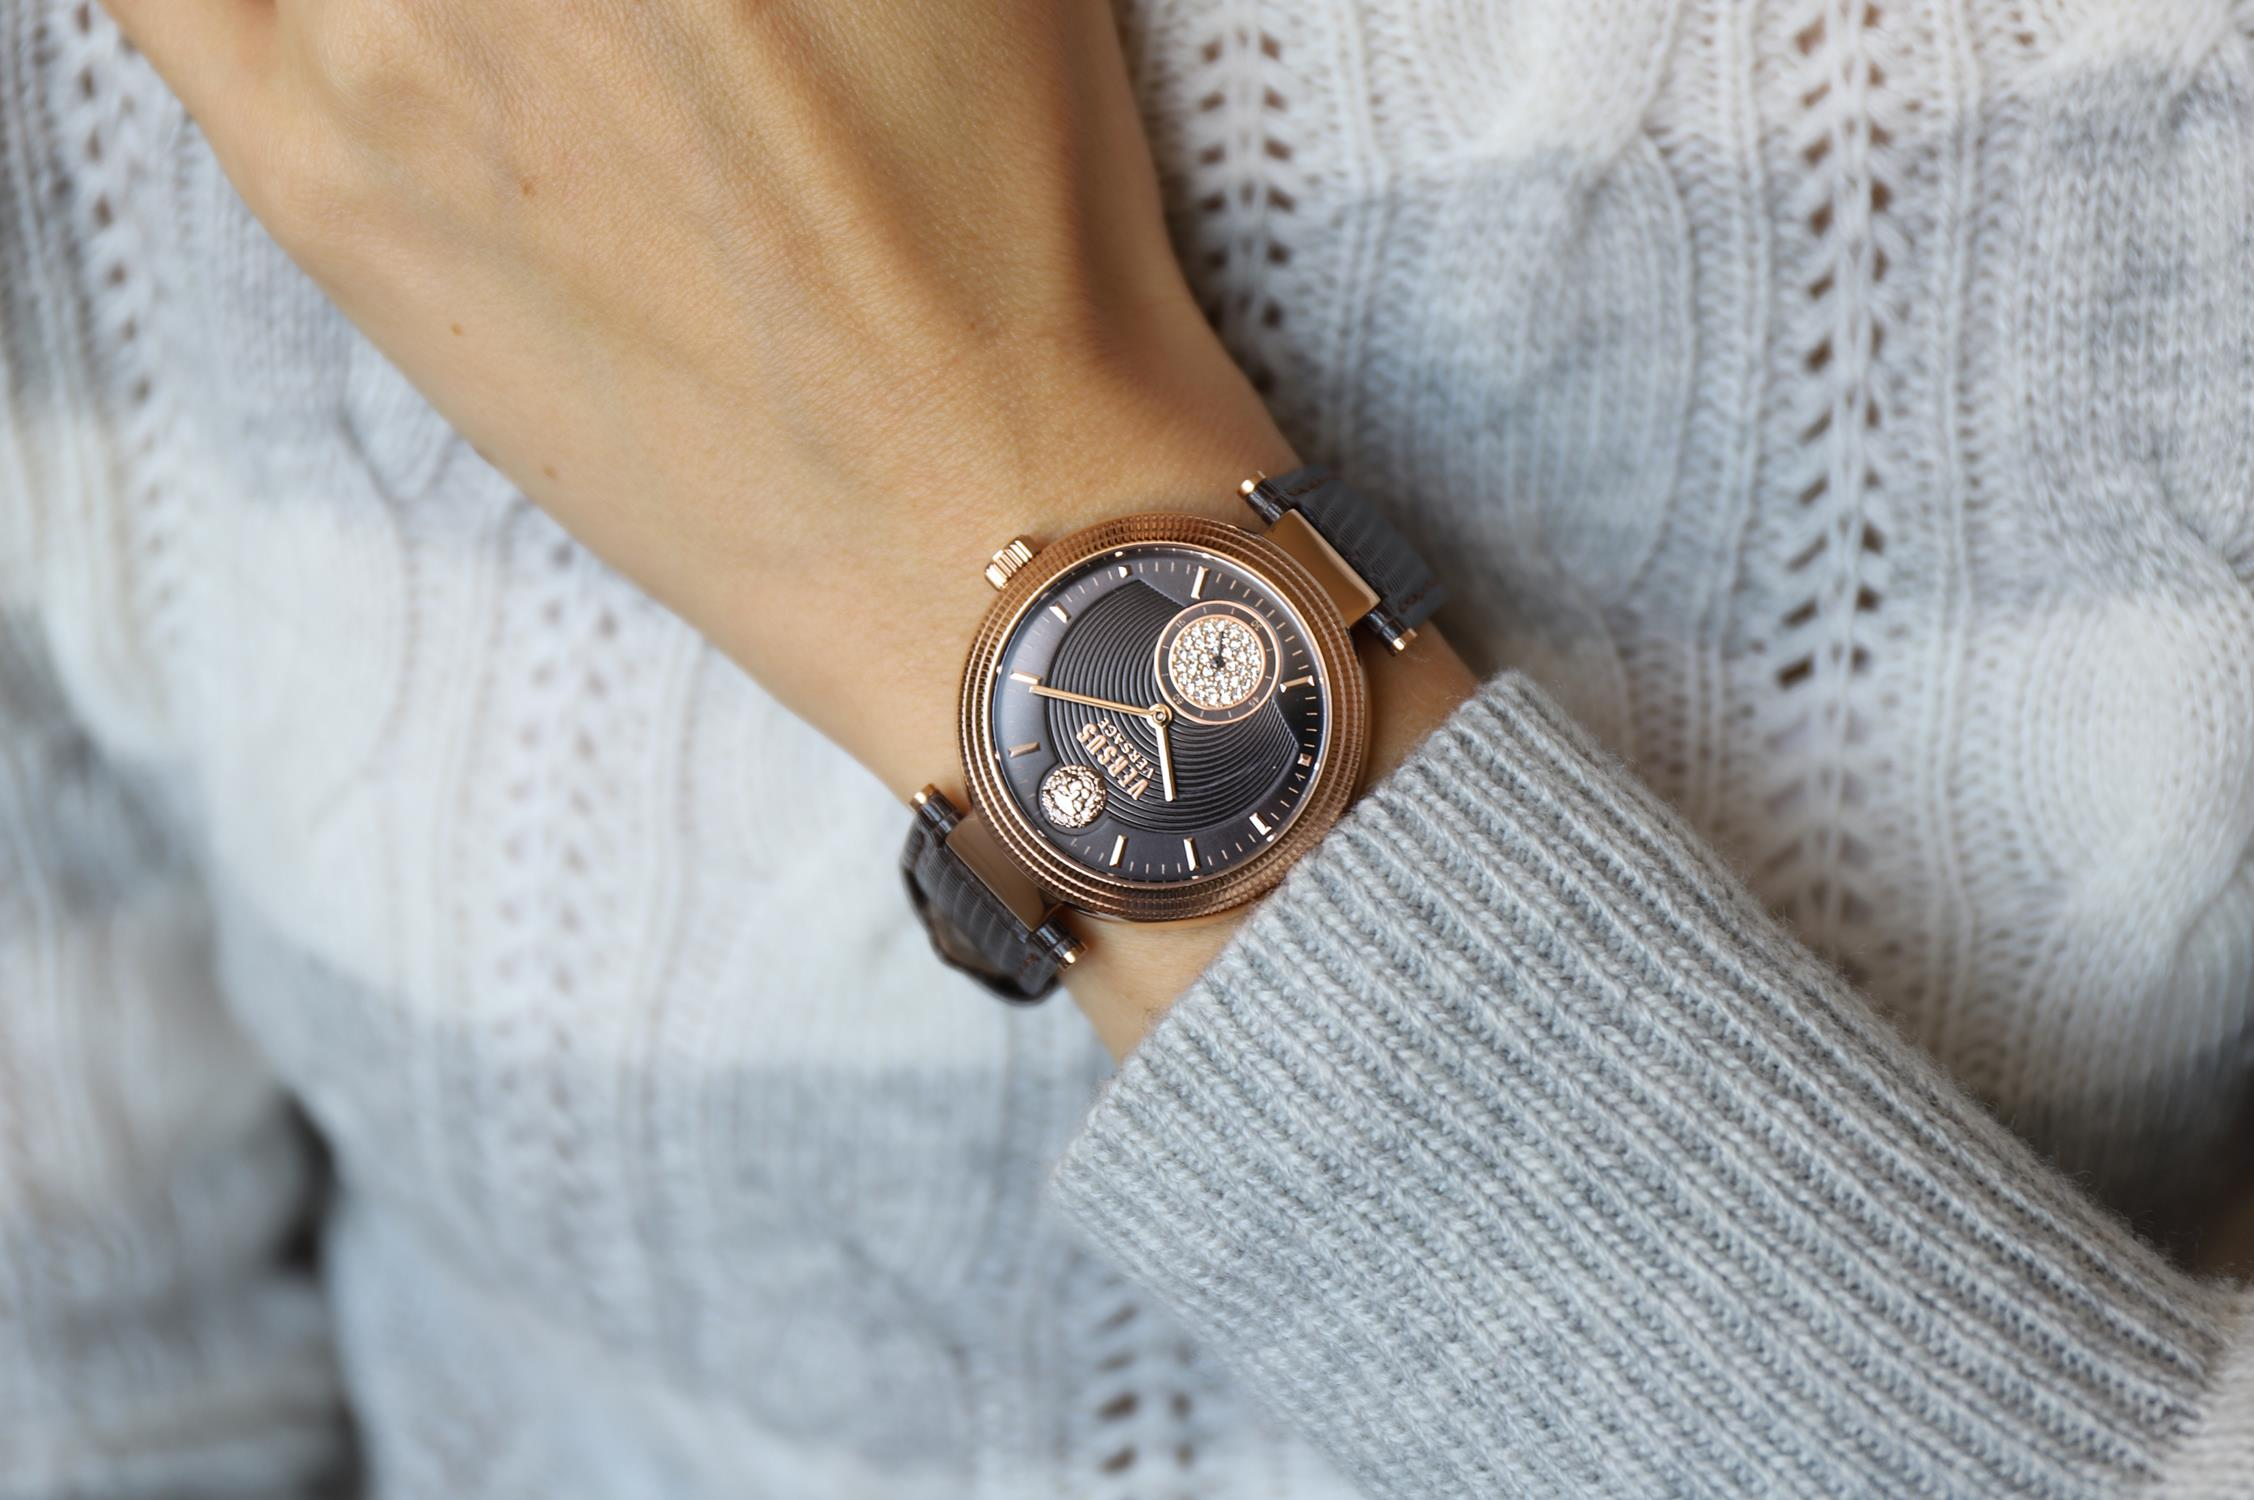 Versus Versace VSP791318 zegarek różowe złoto fashion/modowy Damskie pasek